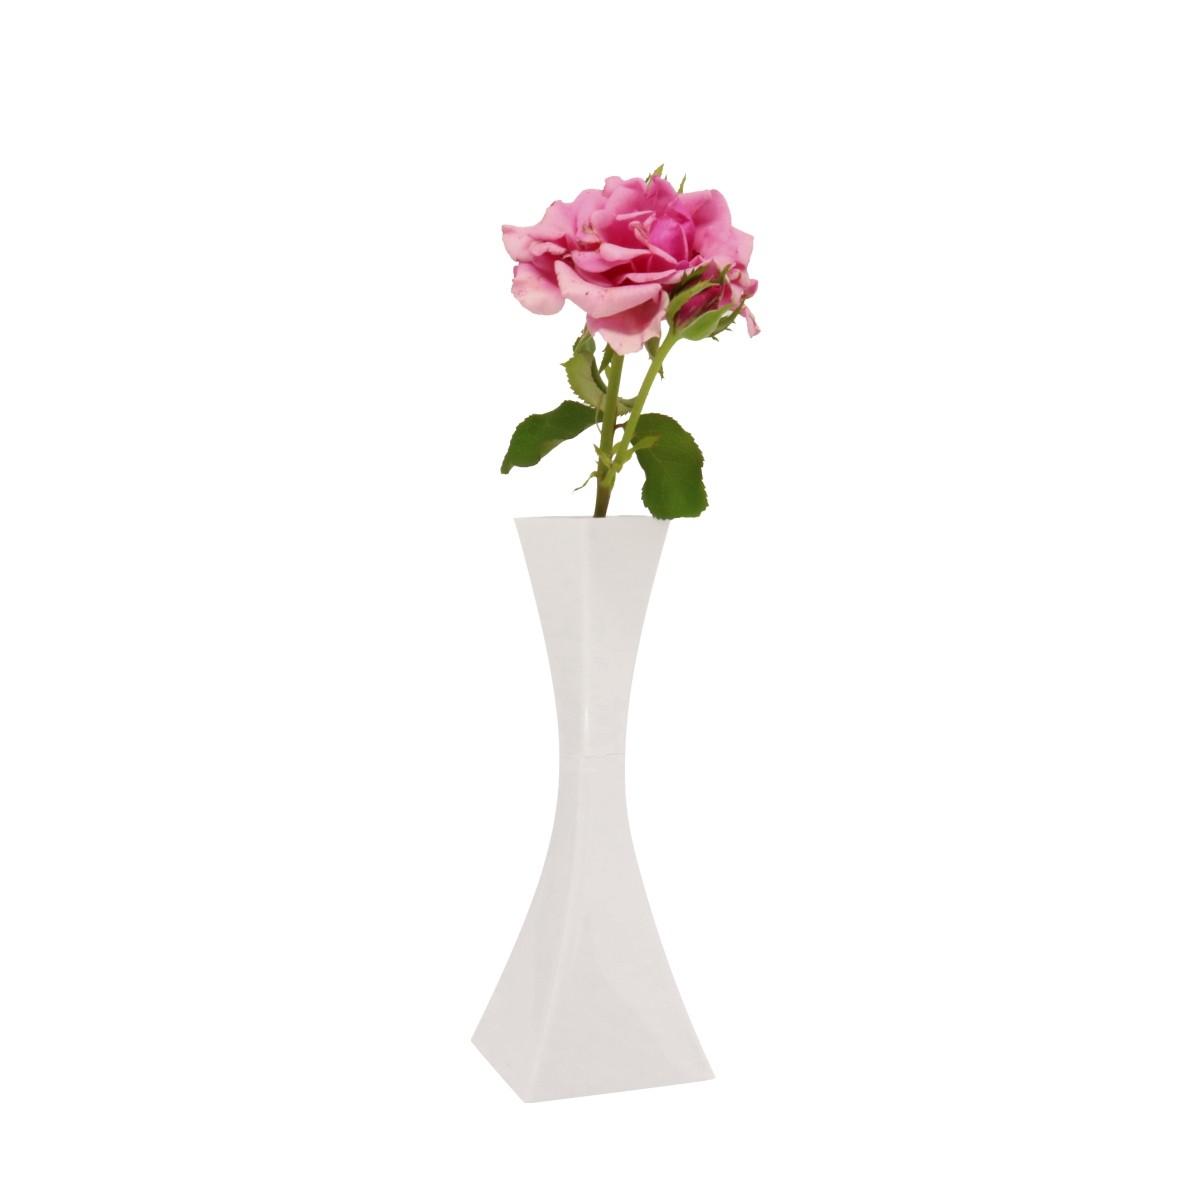 Vaso Solitário Branco 19,5cm x 4cm